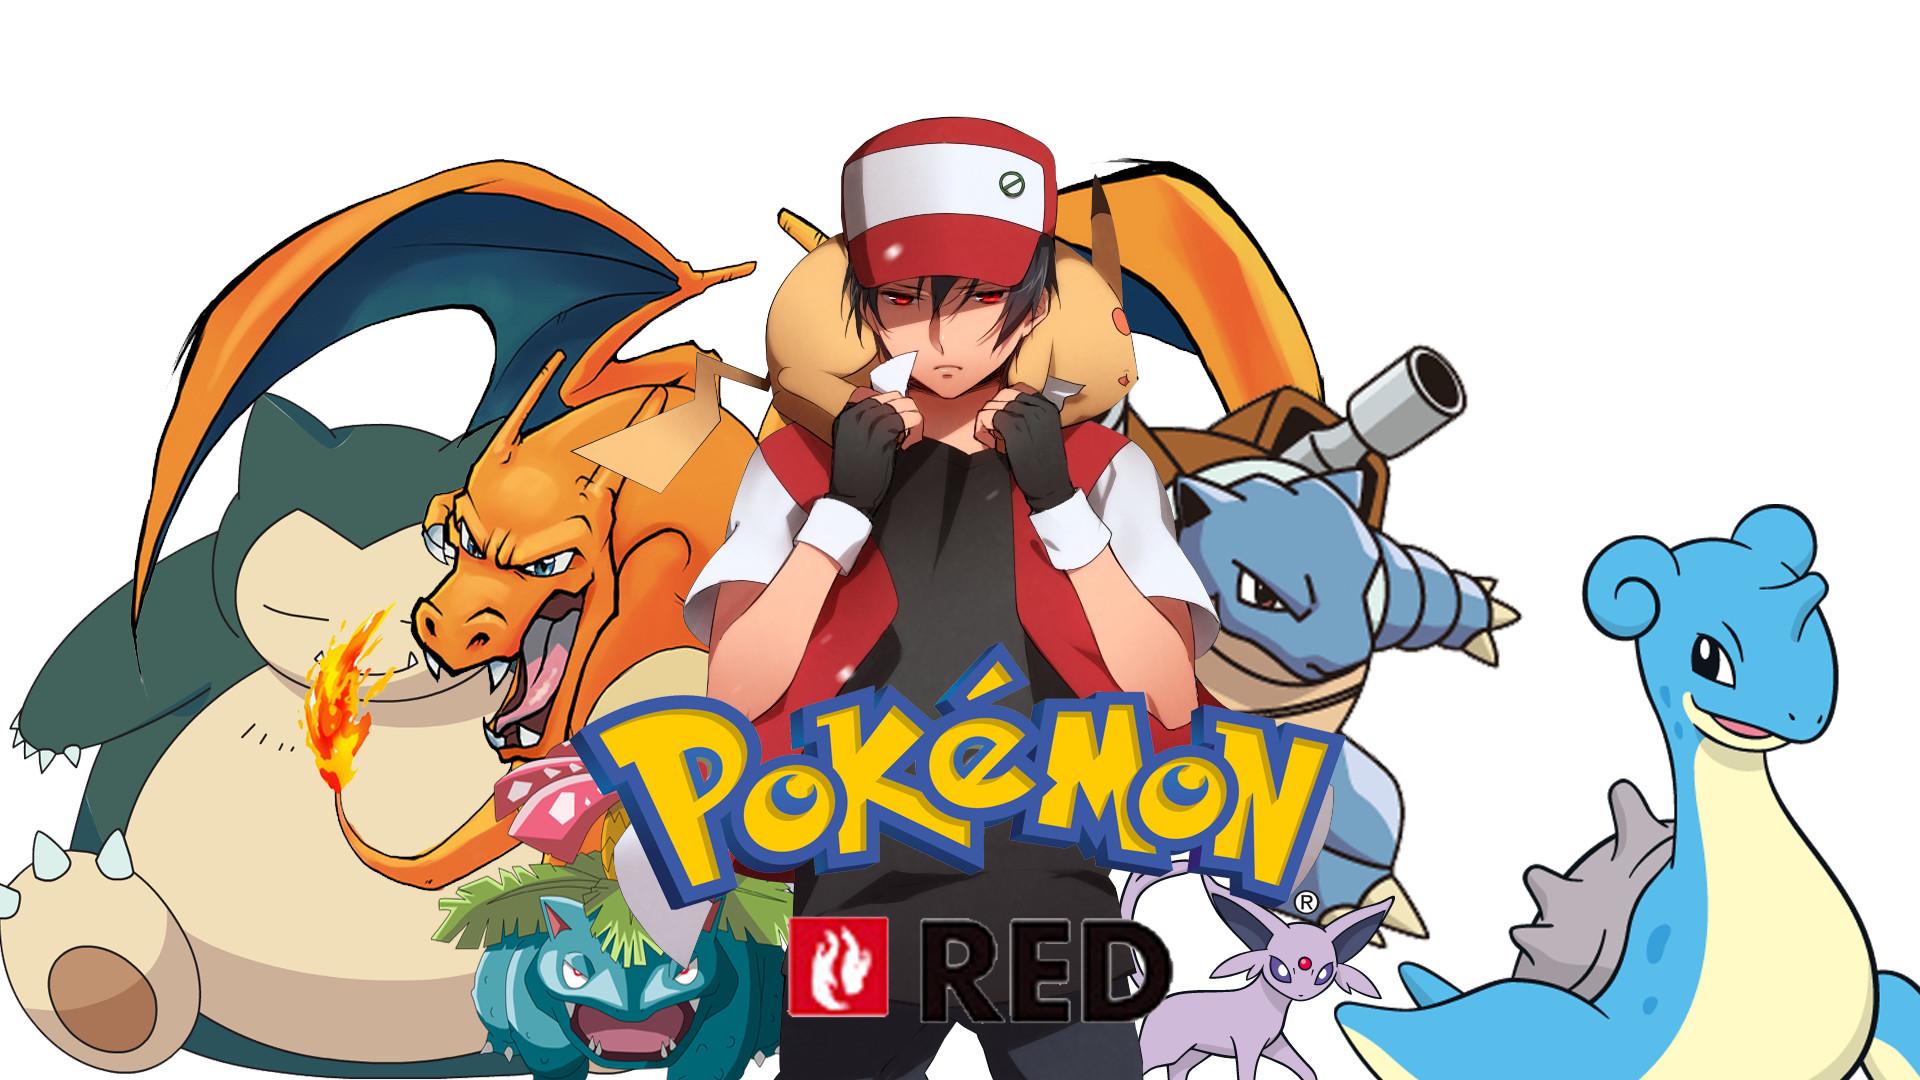 Pokemon Red Wallpaper by Roxxas21 on DeviantArt